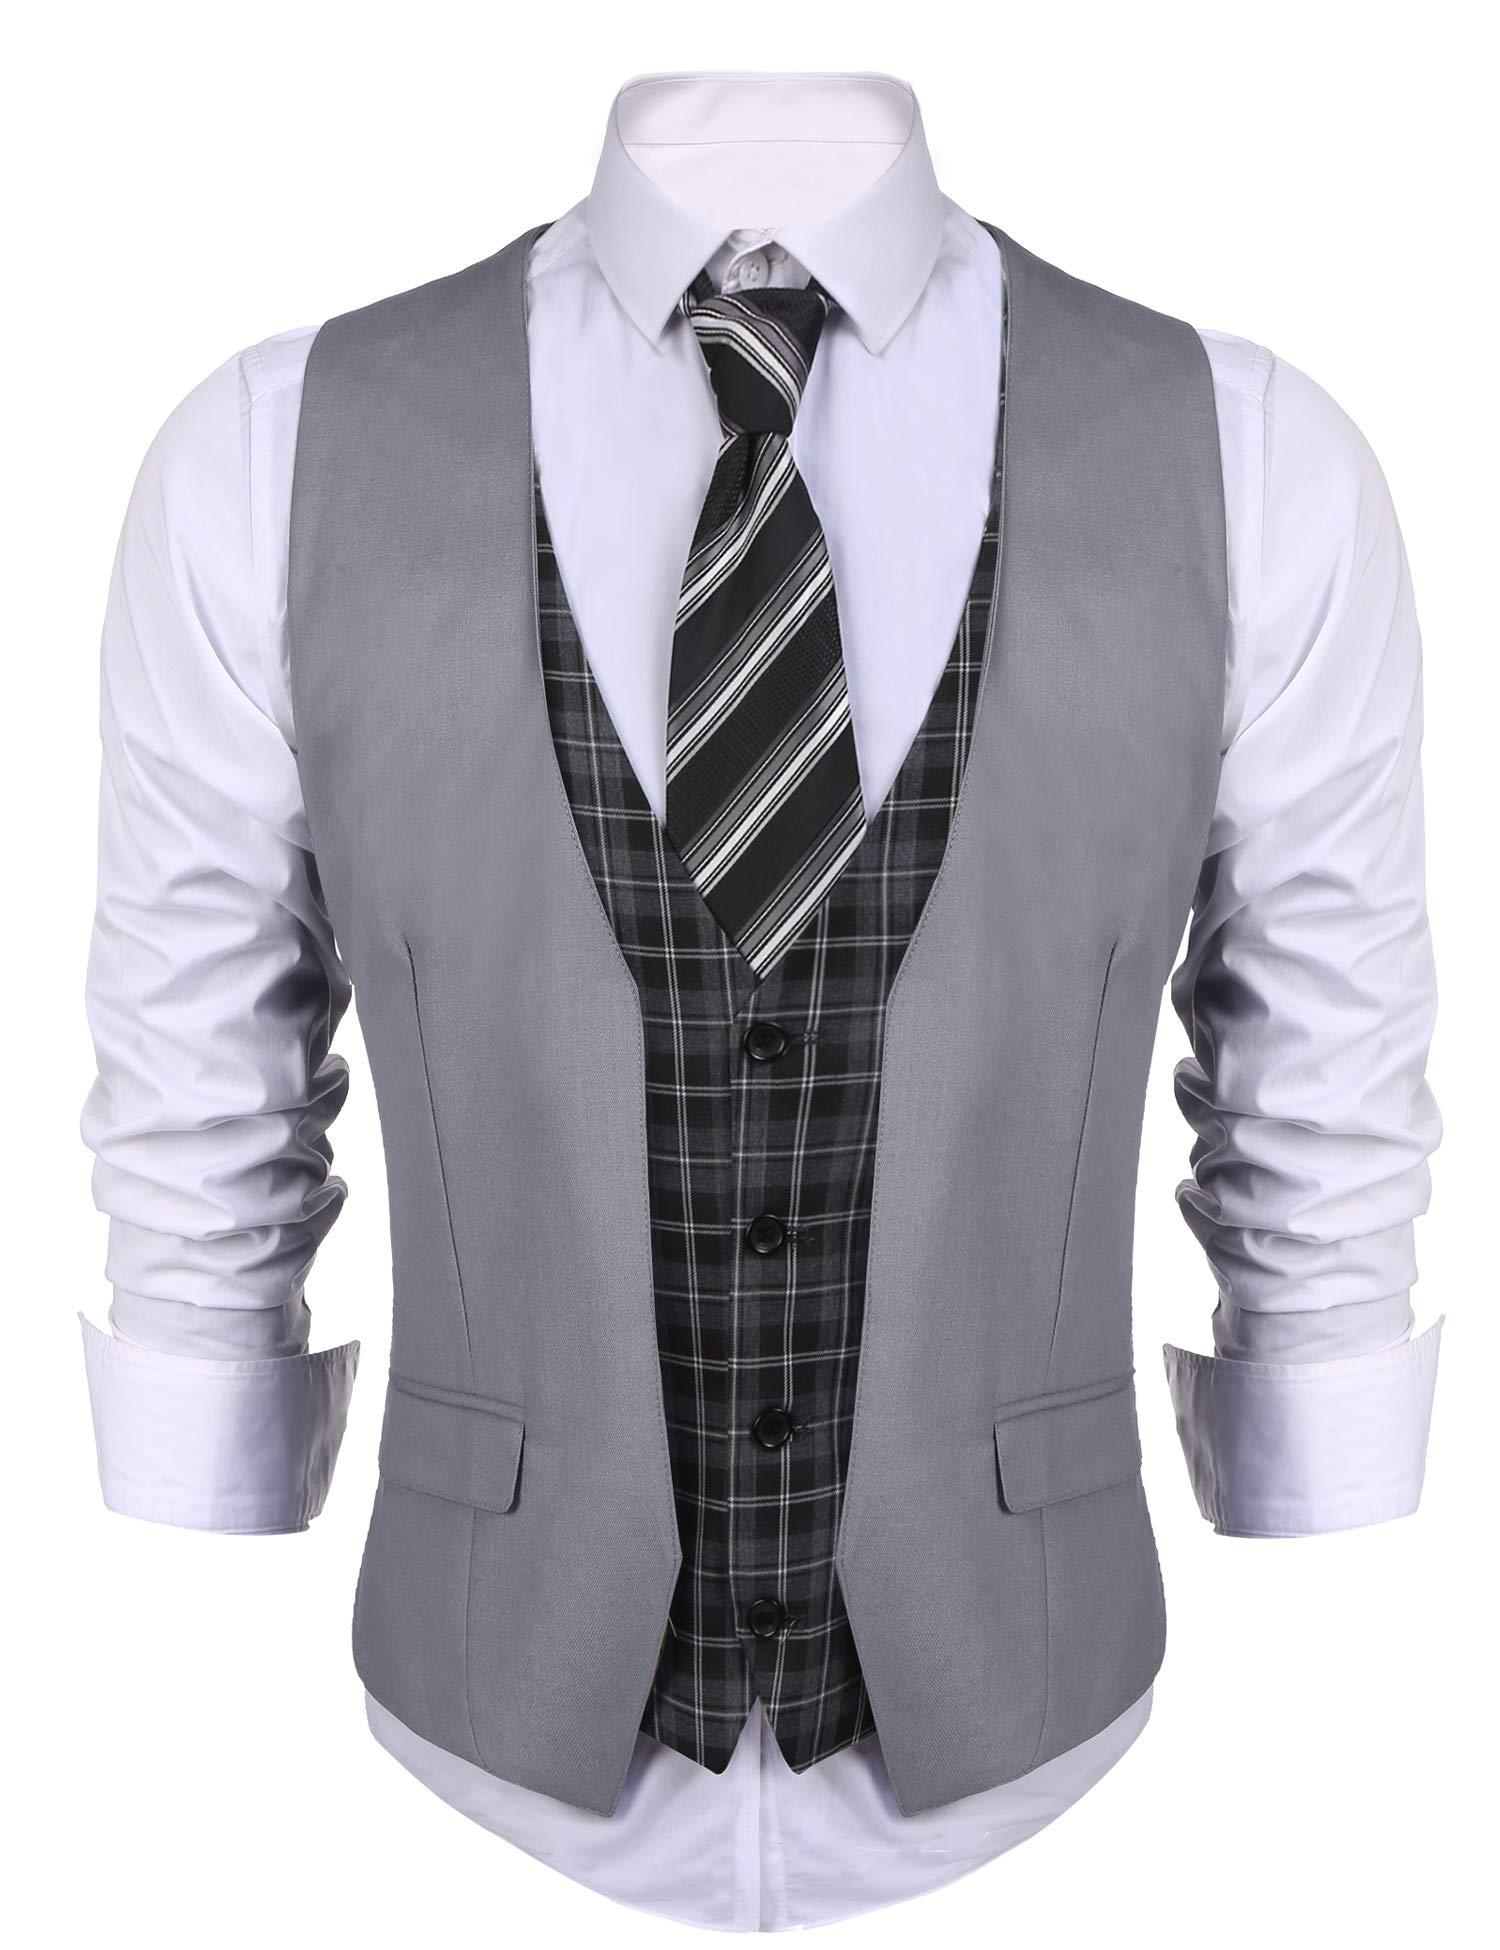 COOFANDY Men's Dress Suit layered Vest V Neck Plaid Patchwork Wedding Waistcoat, Grey, Medium by COOFANDY